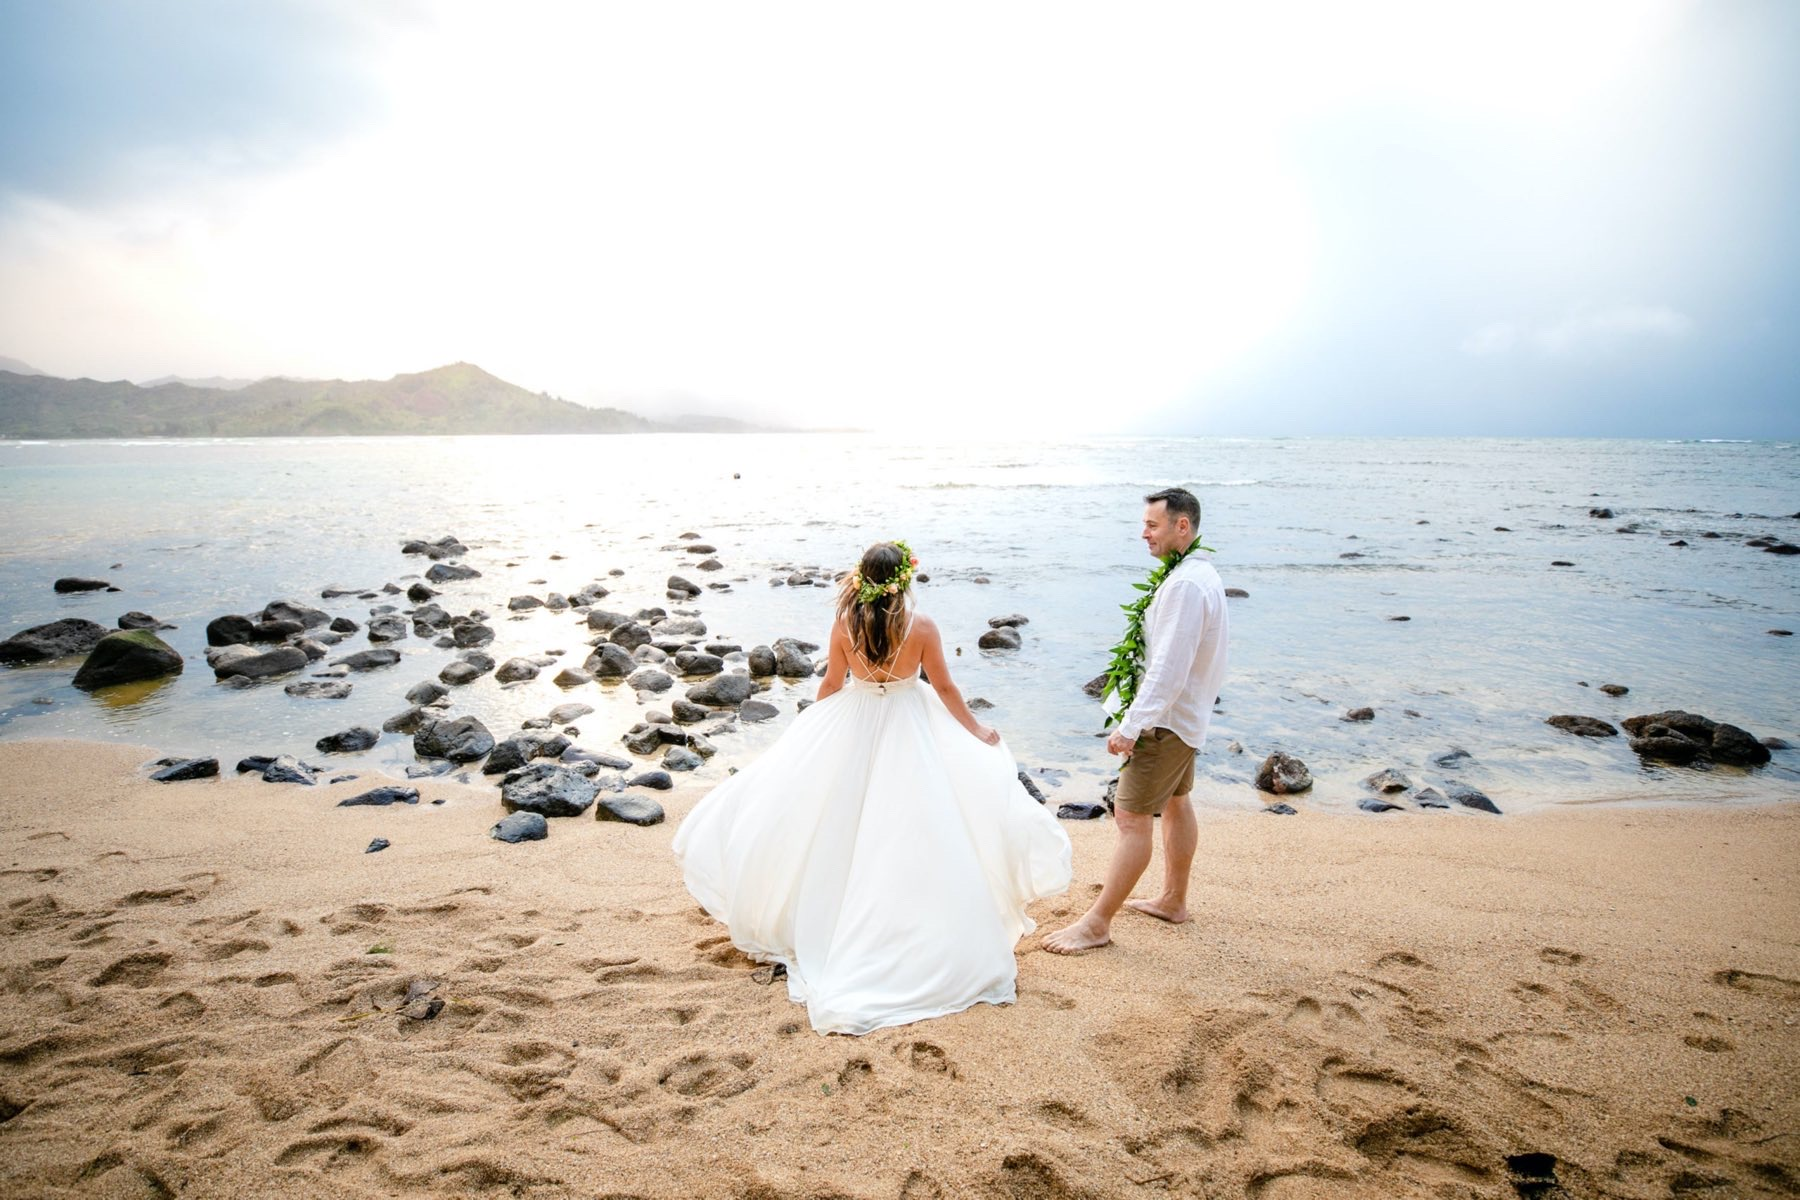 Alicia & Jake on the beach in Kauai.